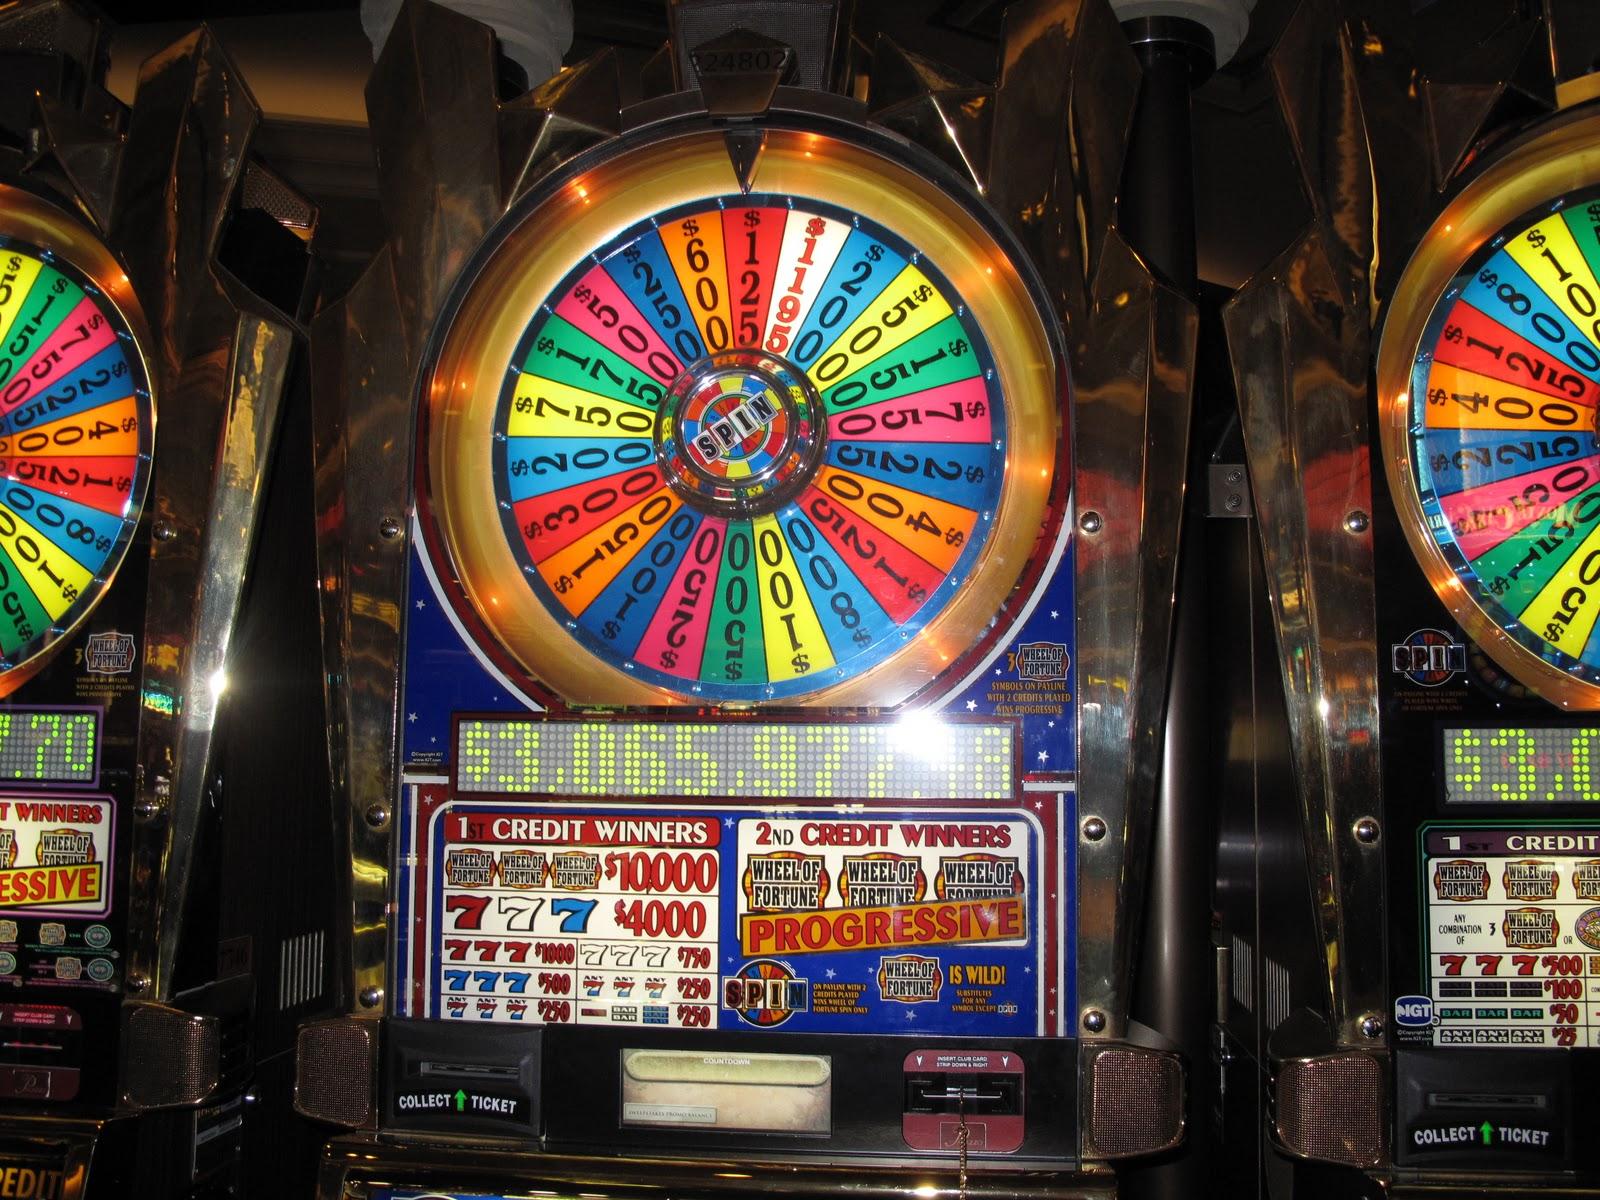 Balsam grove casino